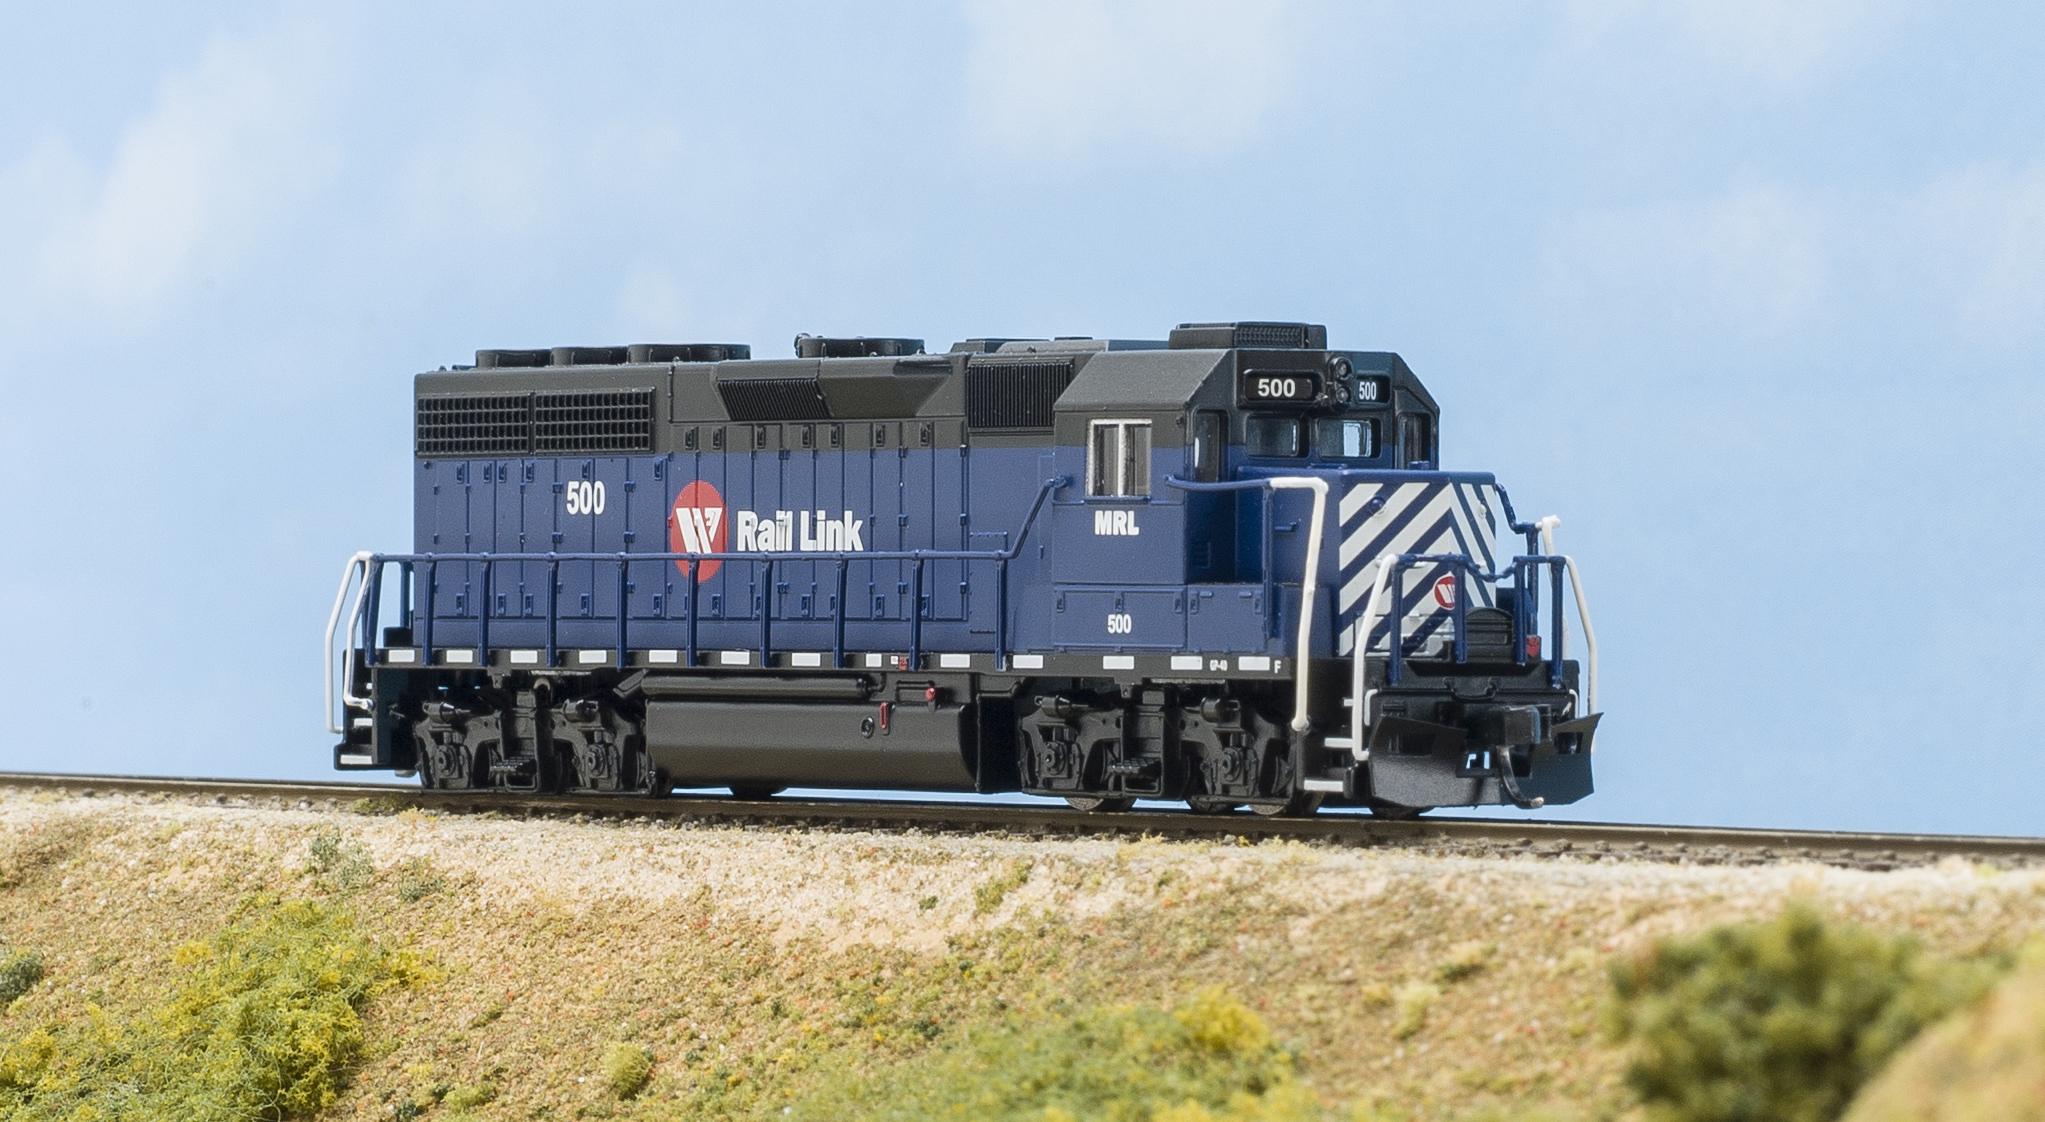 Electro-Motive Division GP40 diesel locomotive